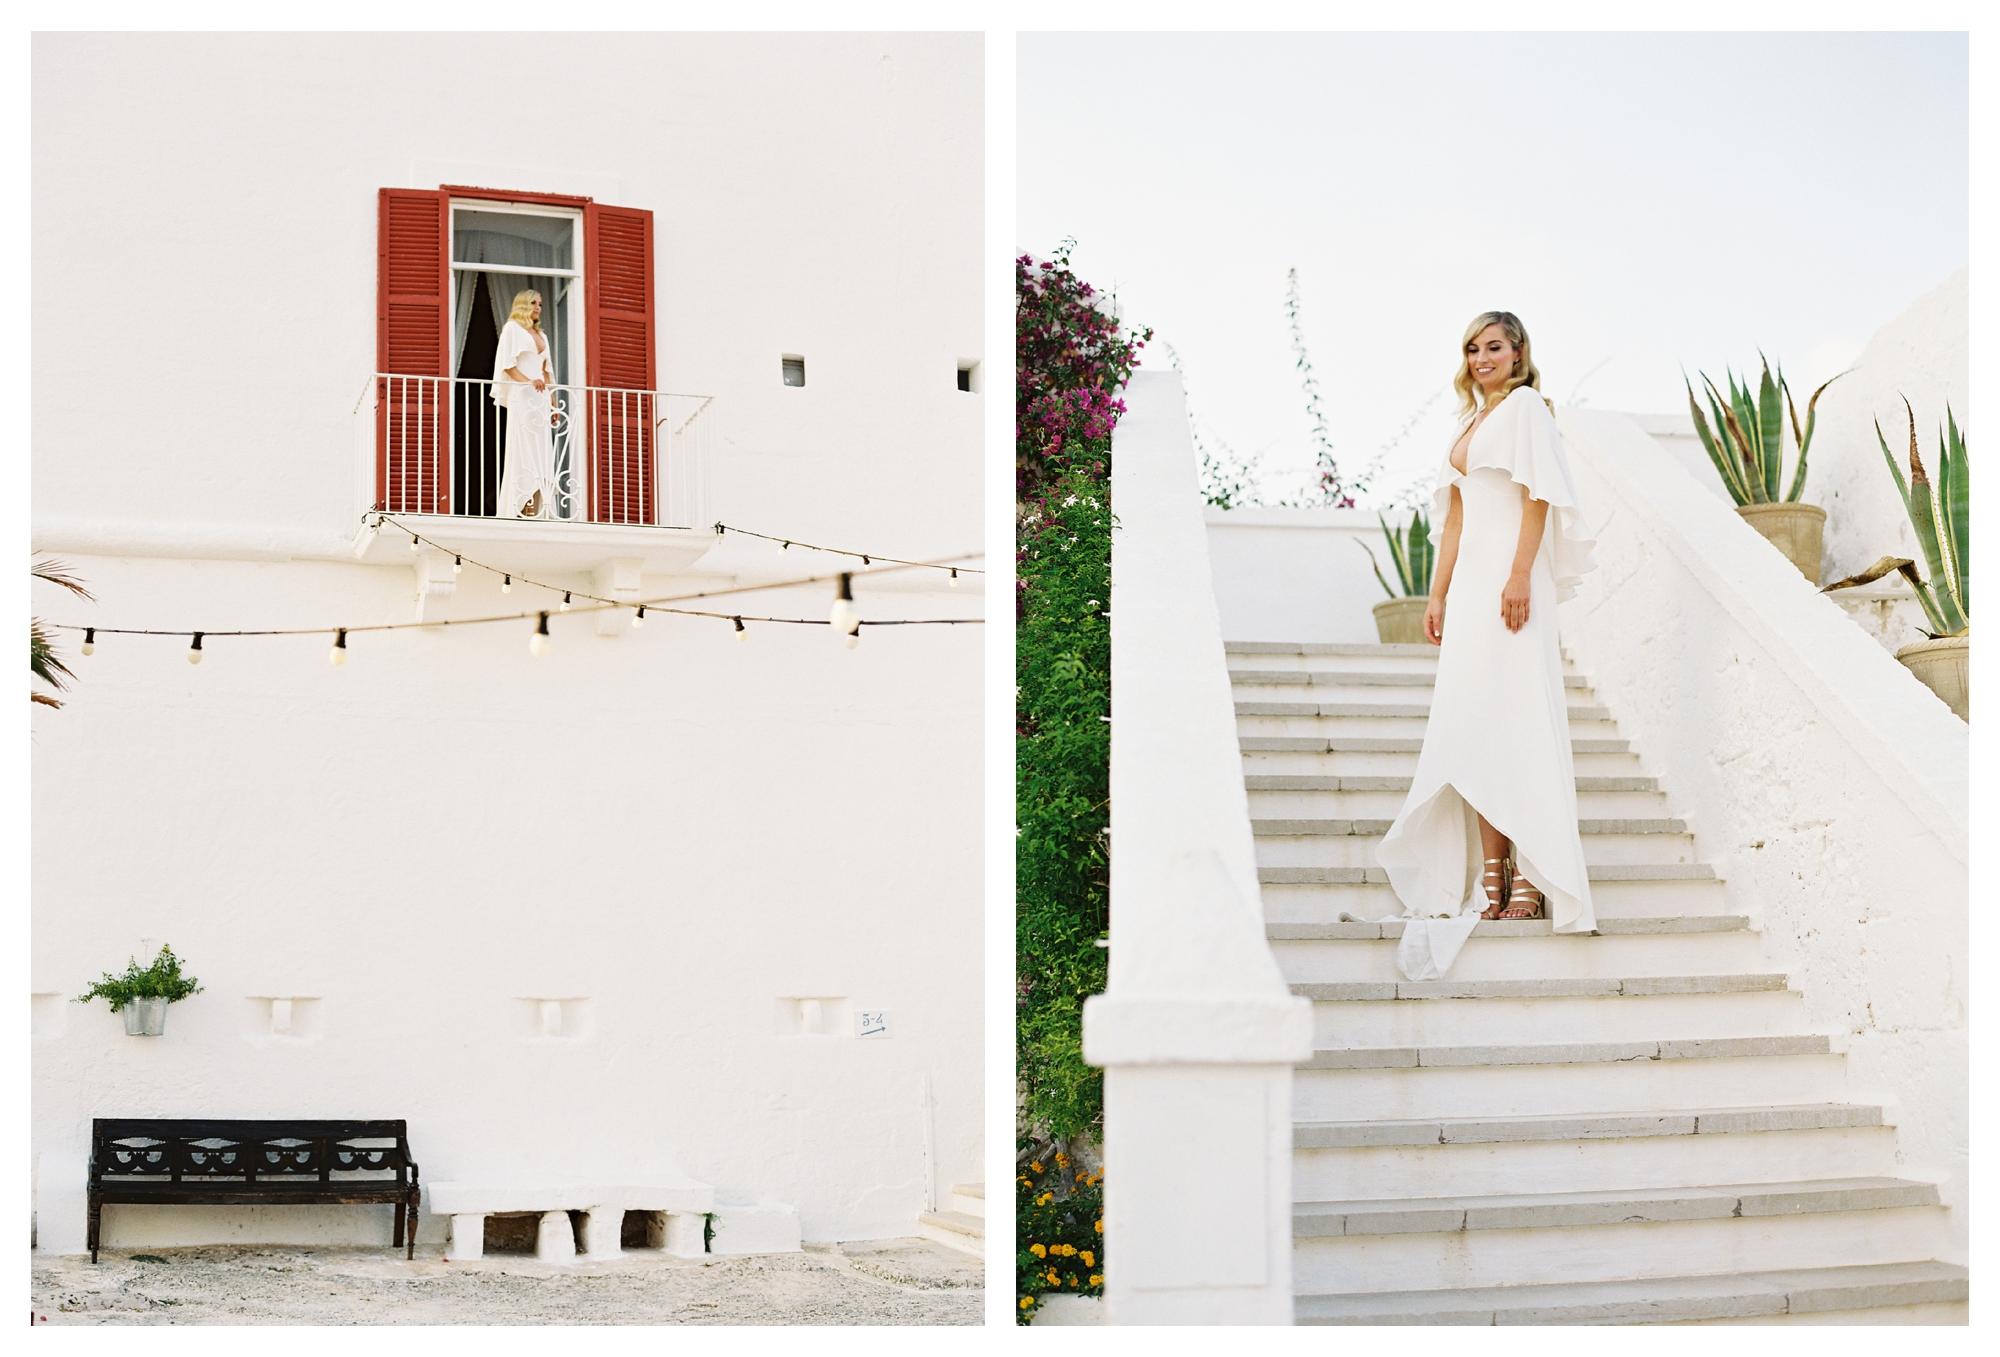 bride portrait, alexandra grecco wedding dress, masseria wedding, puglia wedding, masseria torre coccaro wedding